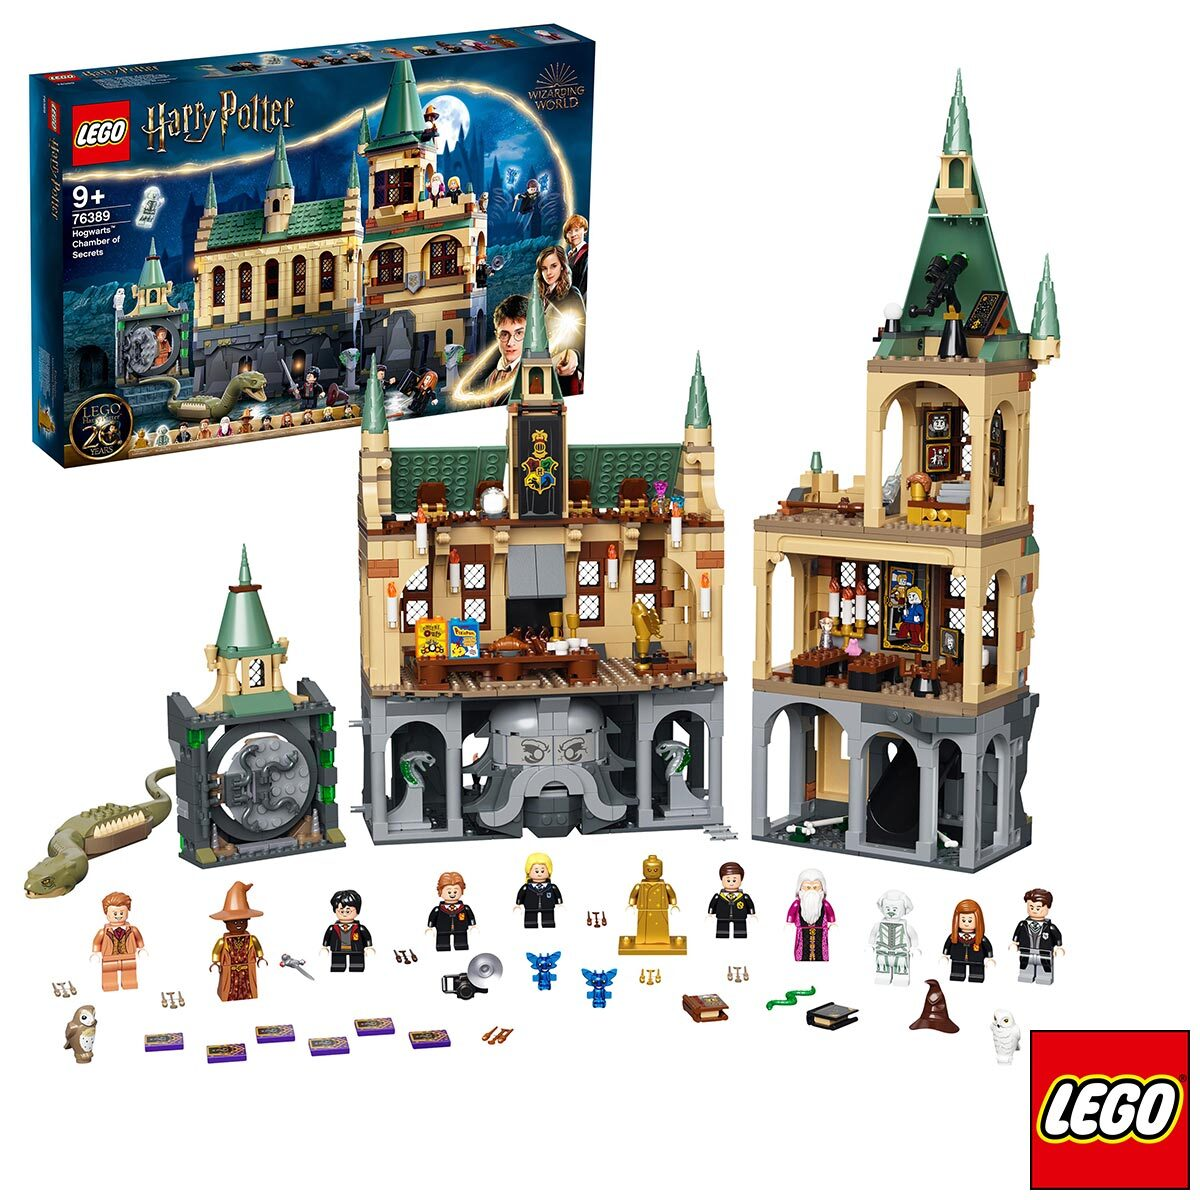 Harry Potter Lego Giveaway Giveaway Image